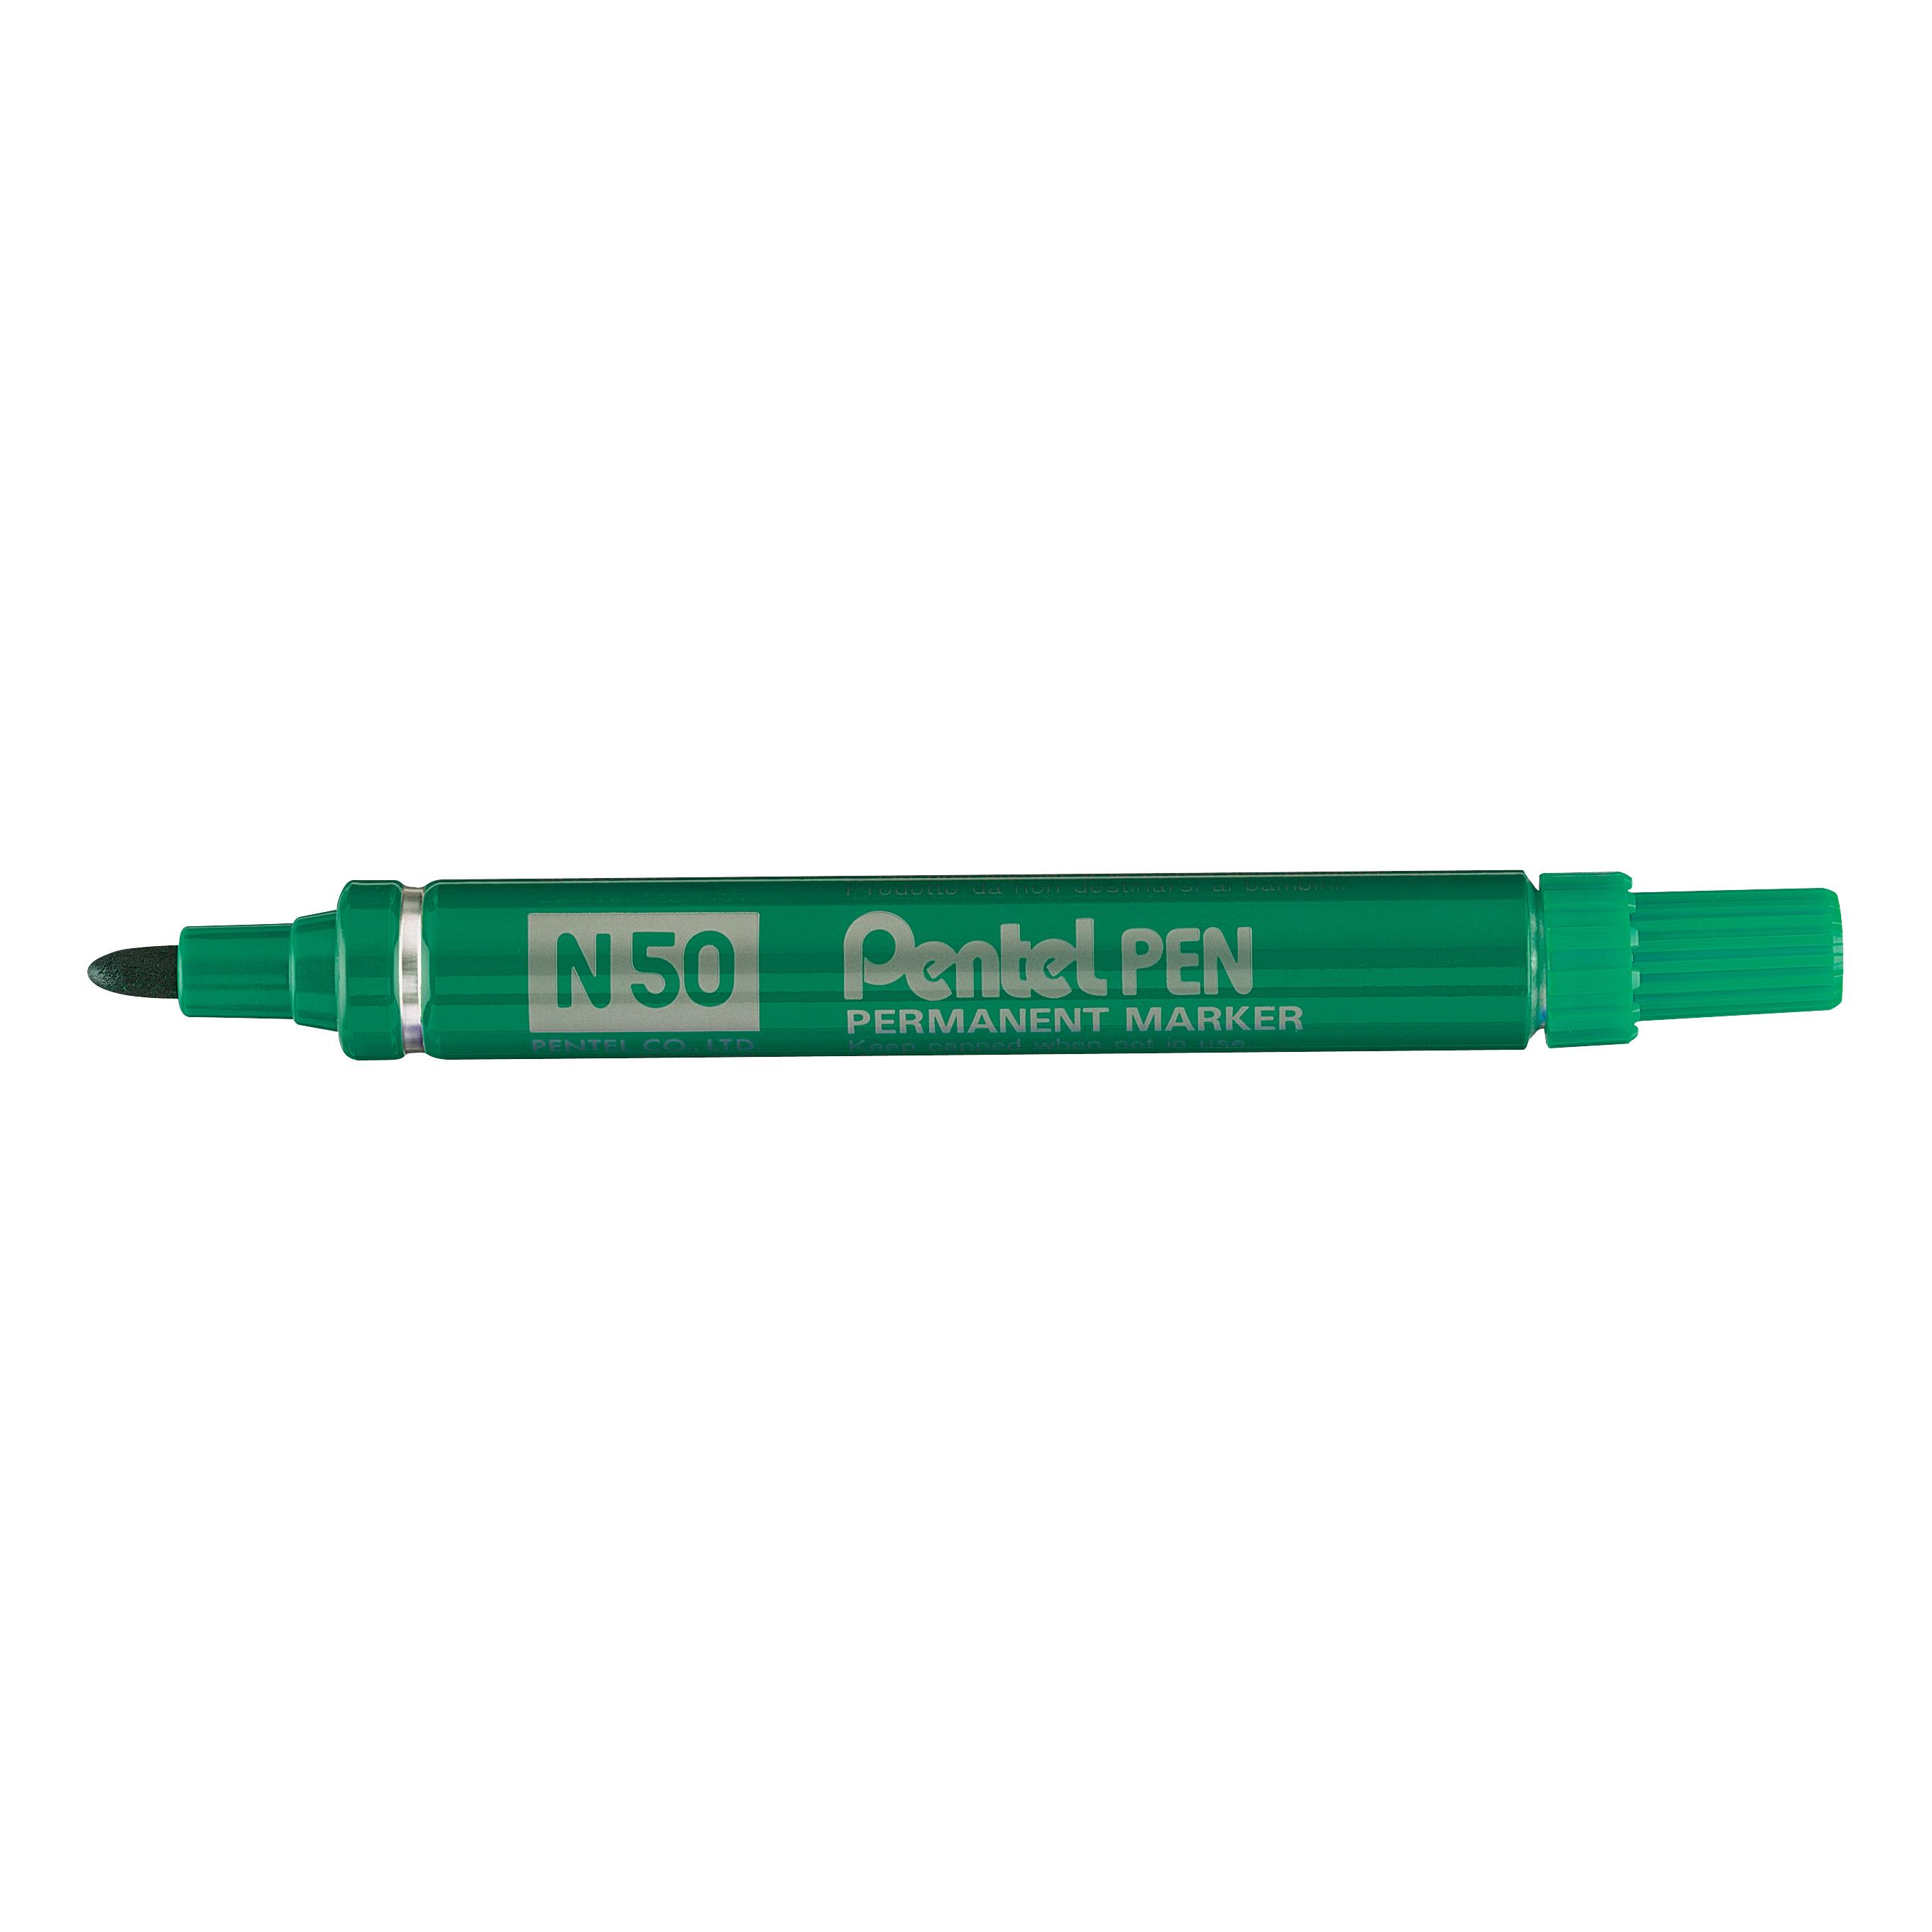 Pentel N50 Permanent Marker Bullet 4.3mm Tip 2.2mm Line Green Ref N50-D [Pack 12]